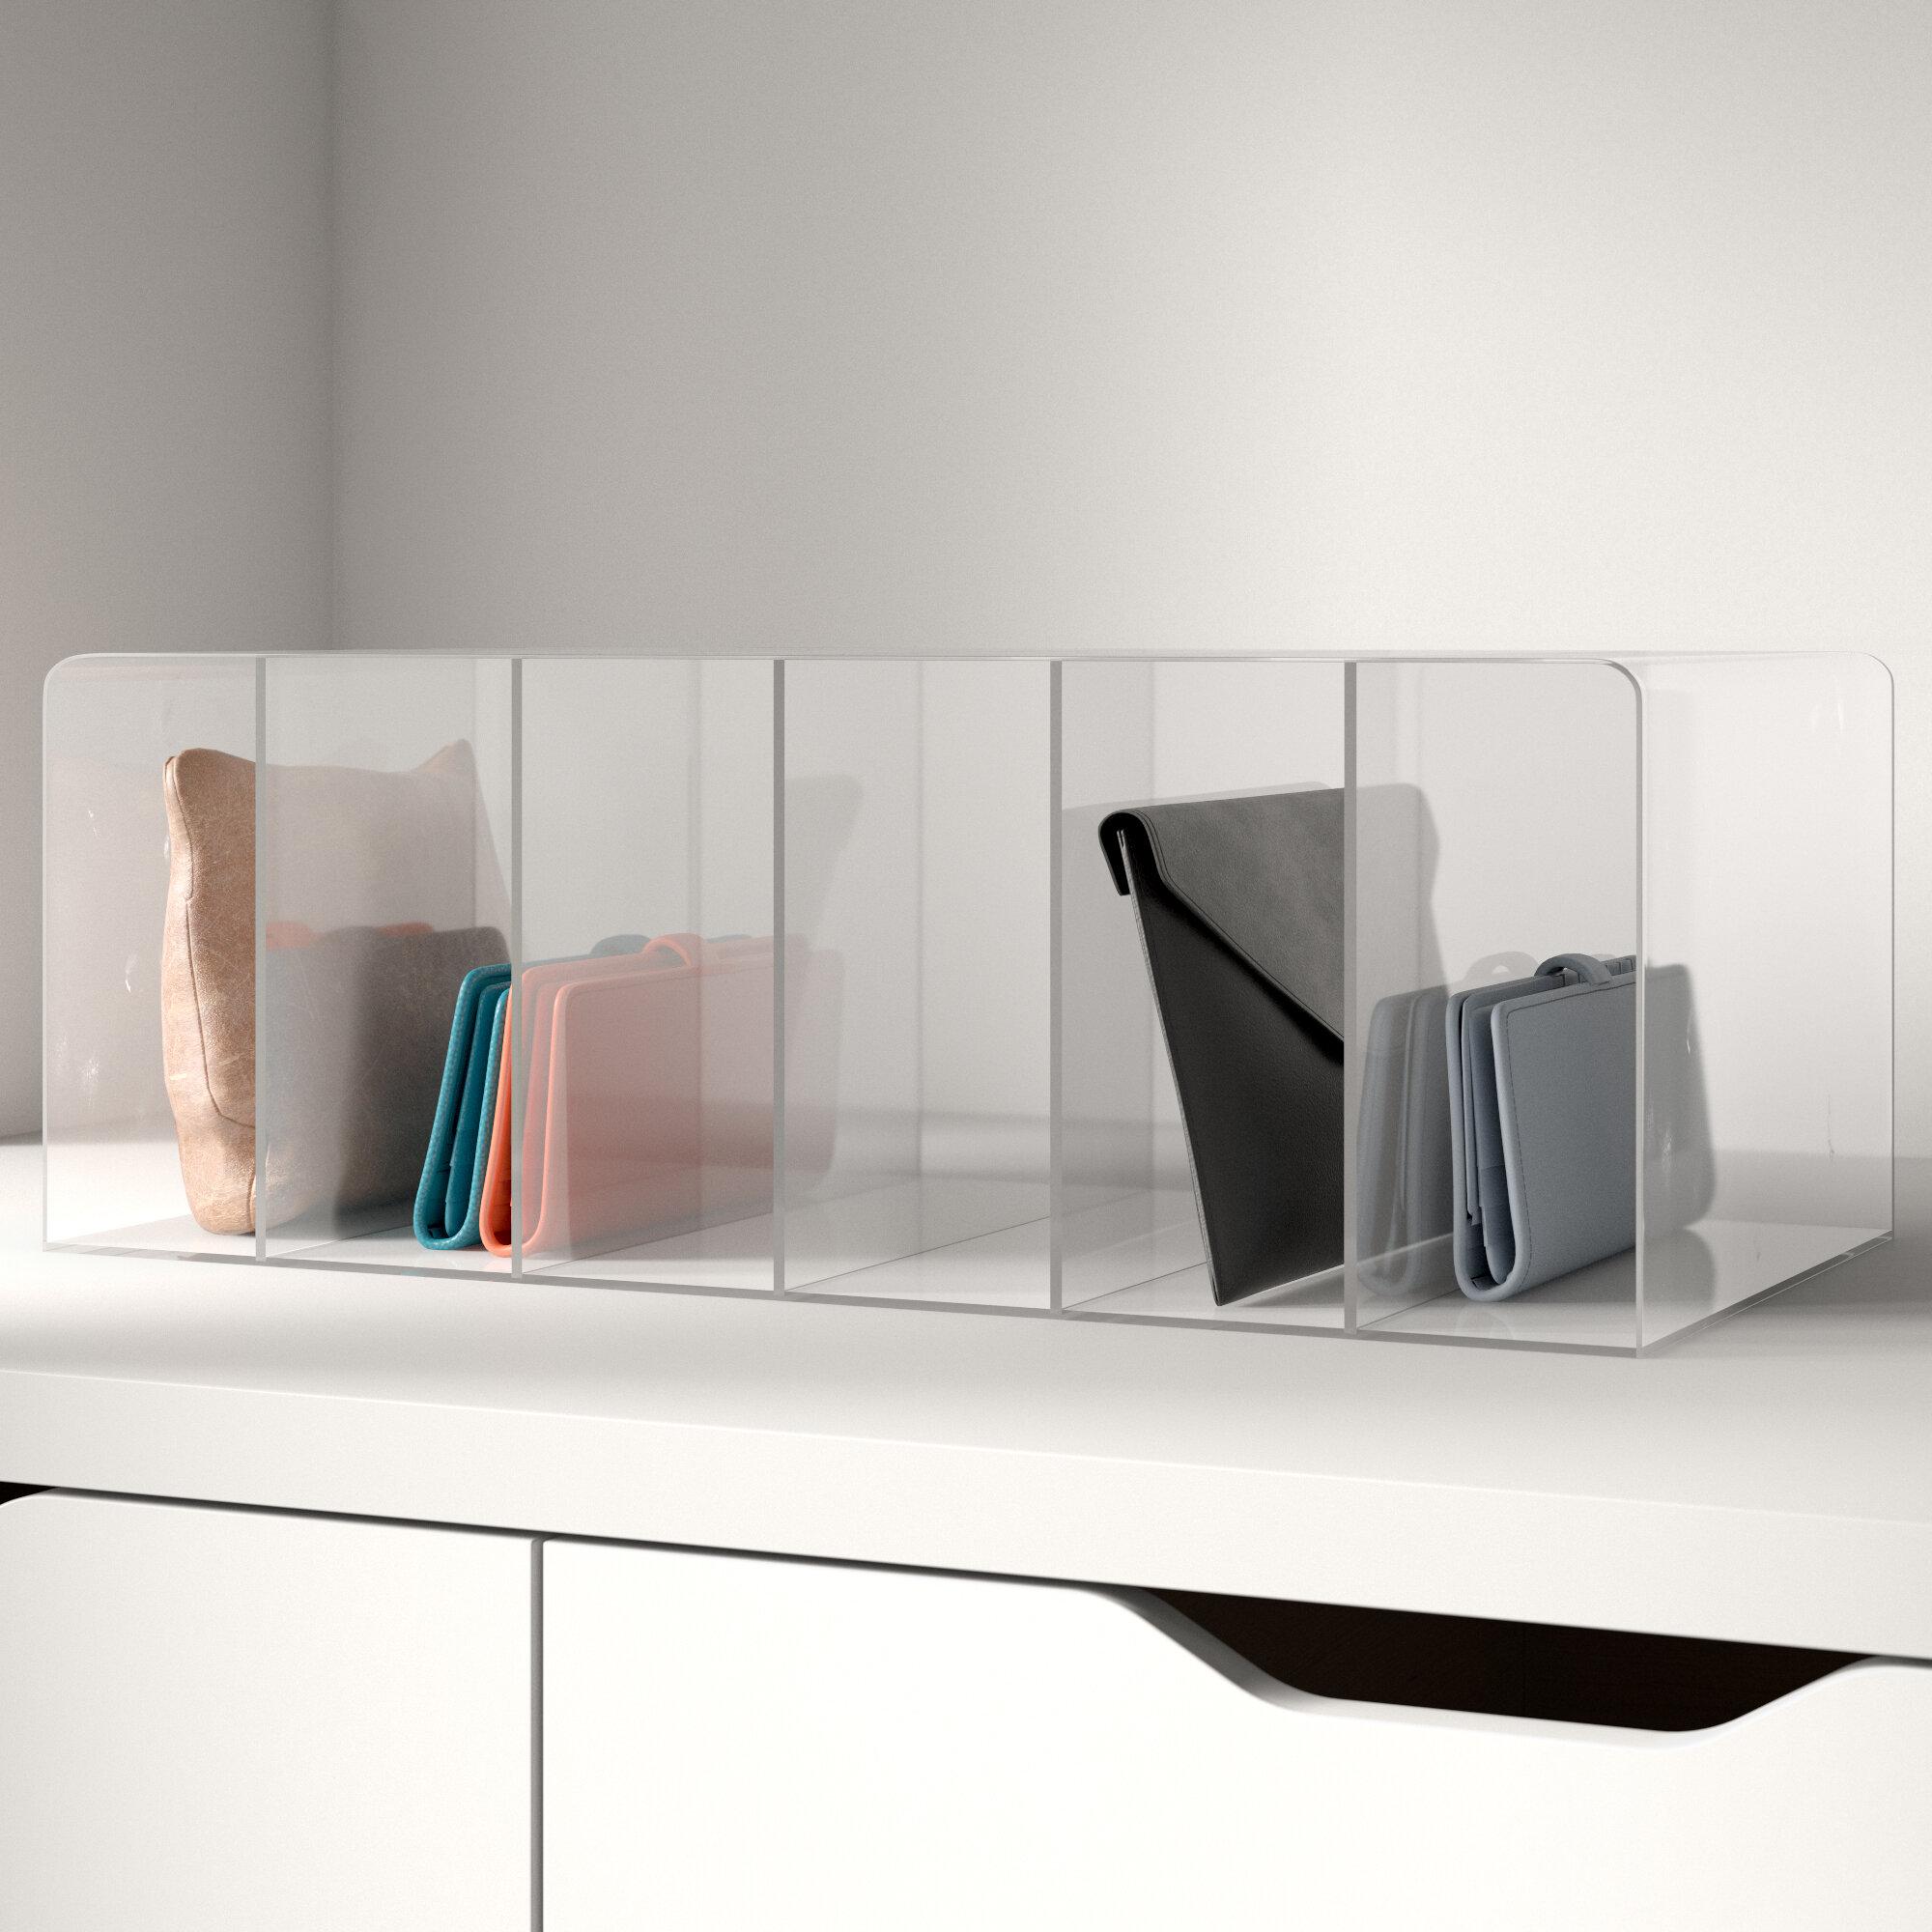 deluxe-acrylic-6-slot-purse-handbag-shelf-top-organizer-clear-lucite.jpg